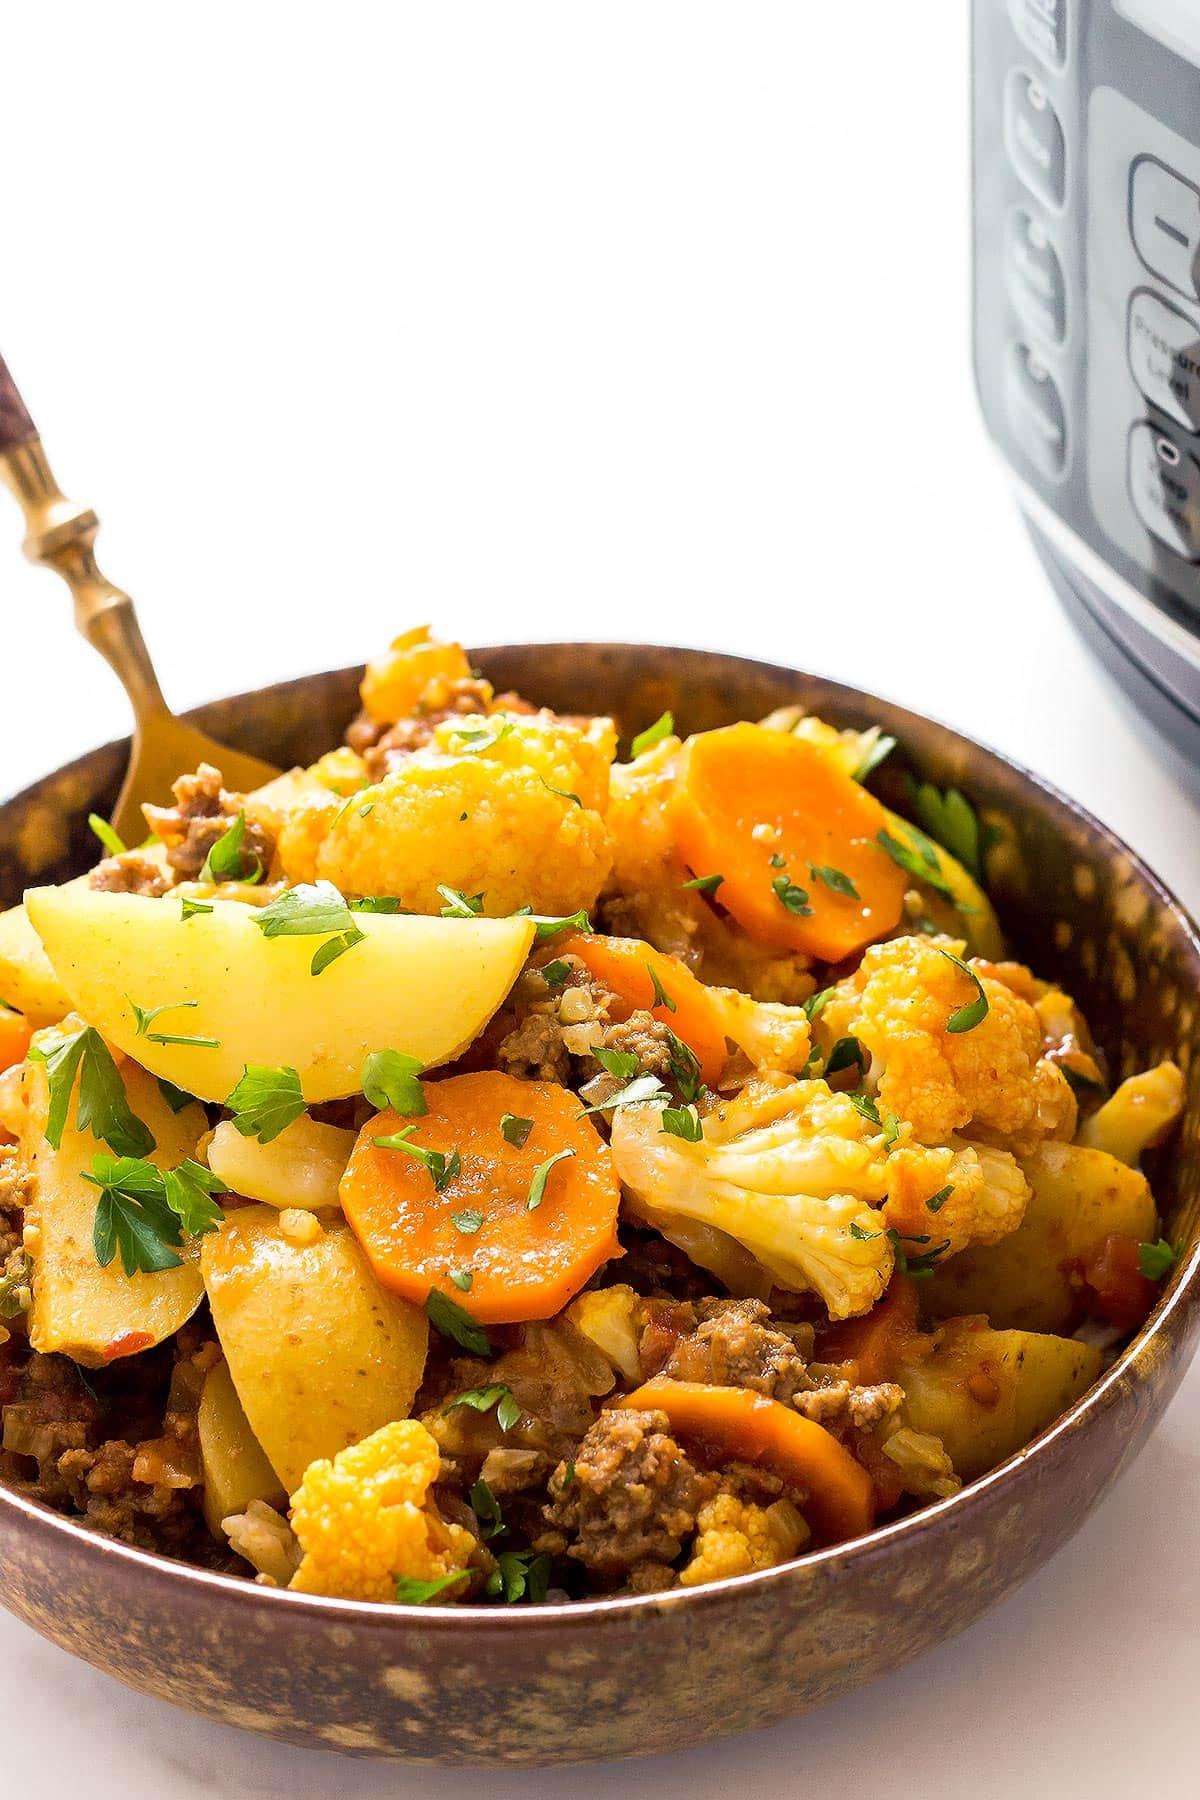 Dish of keema curry